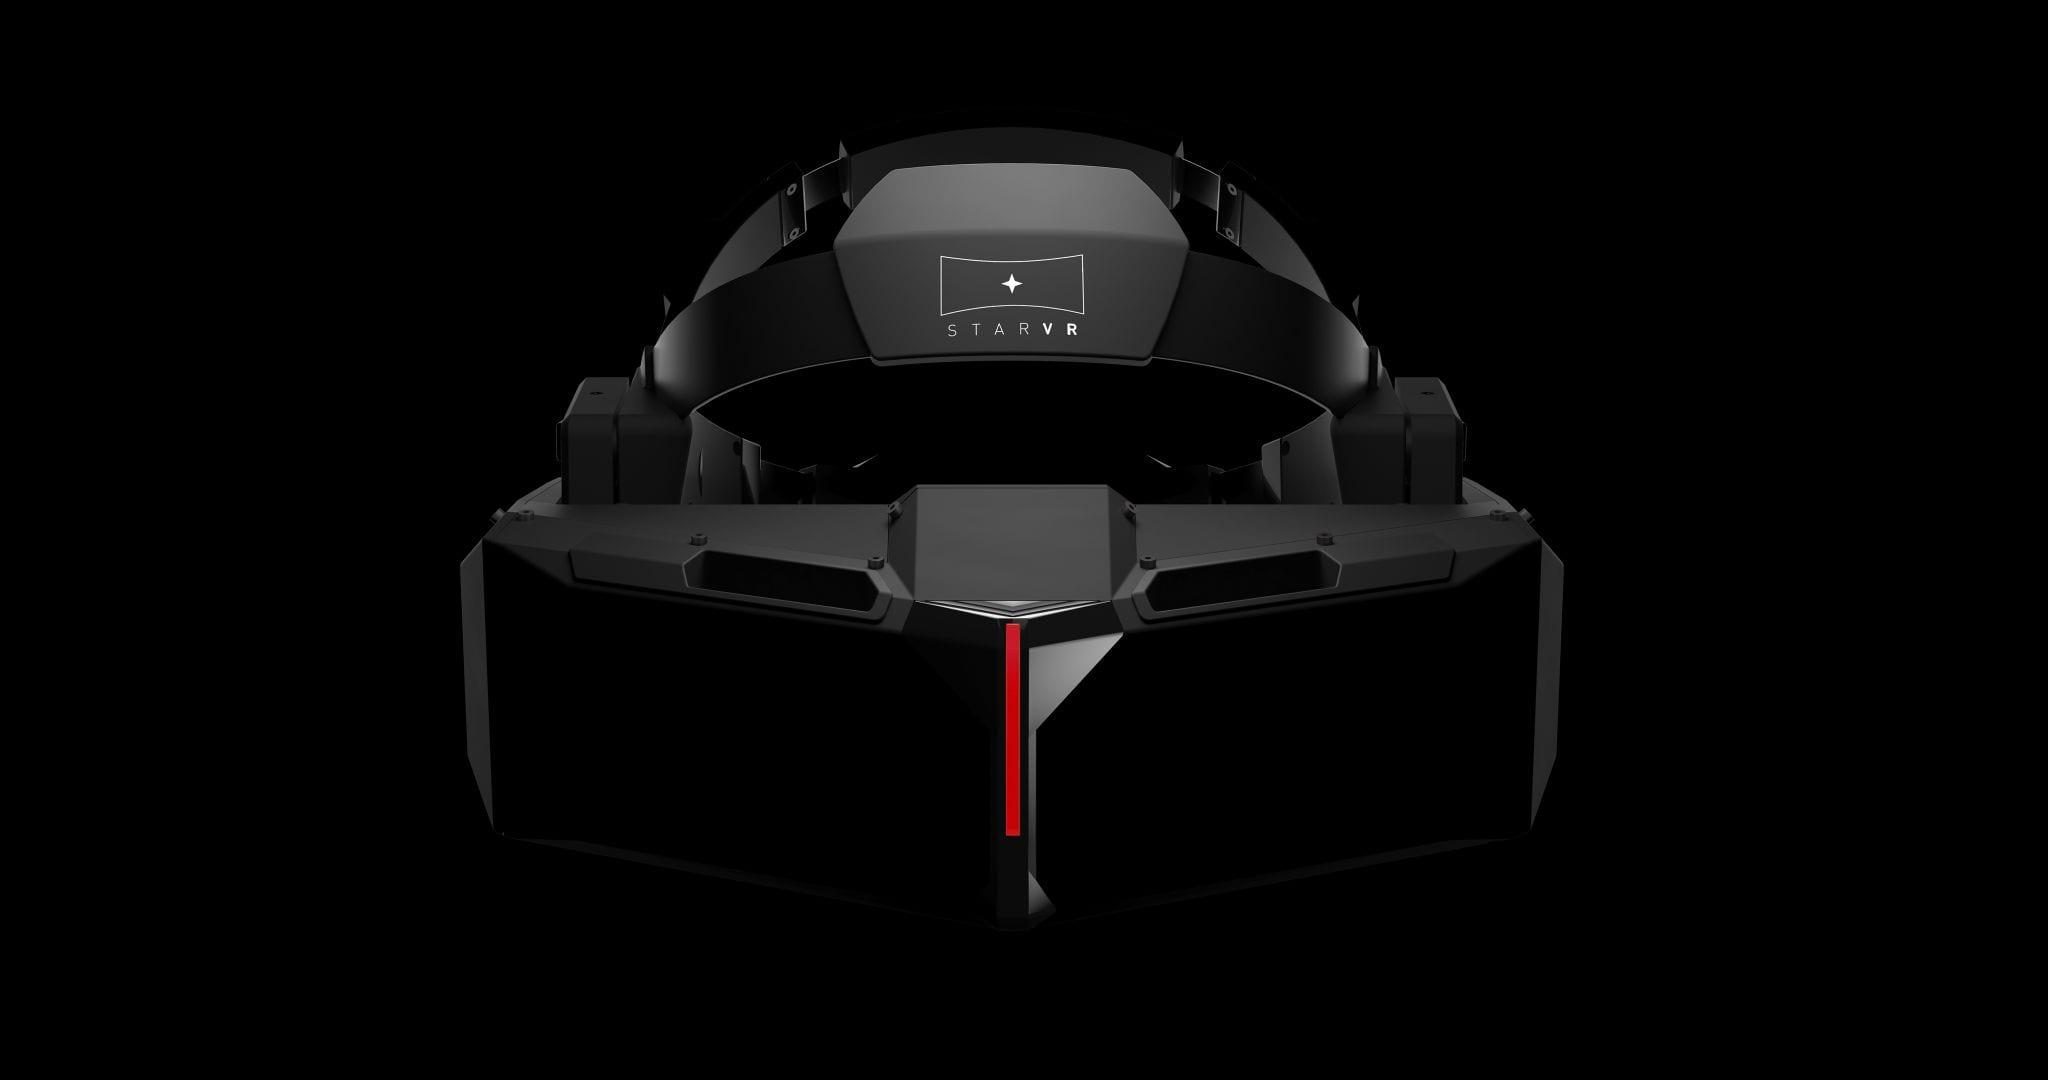 starvr VR